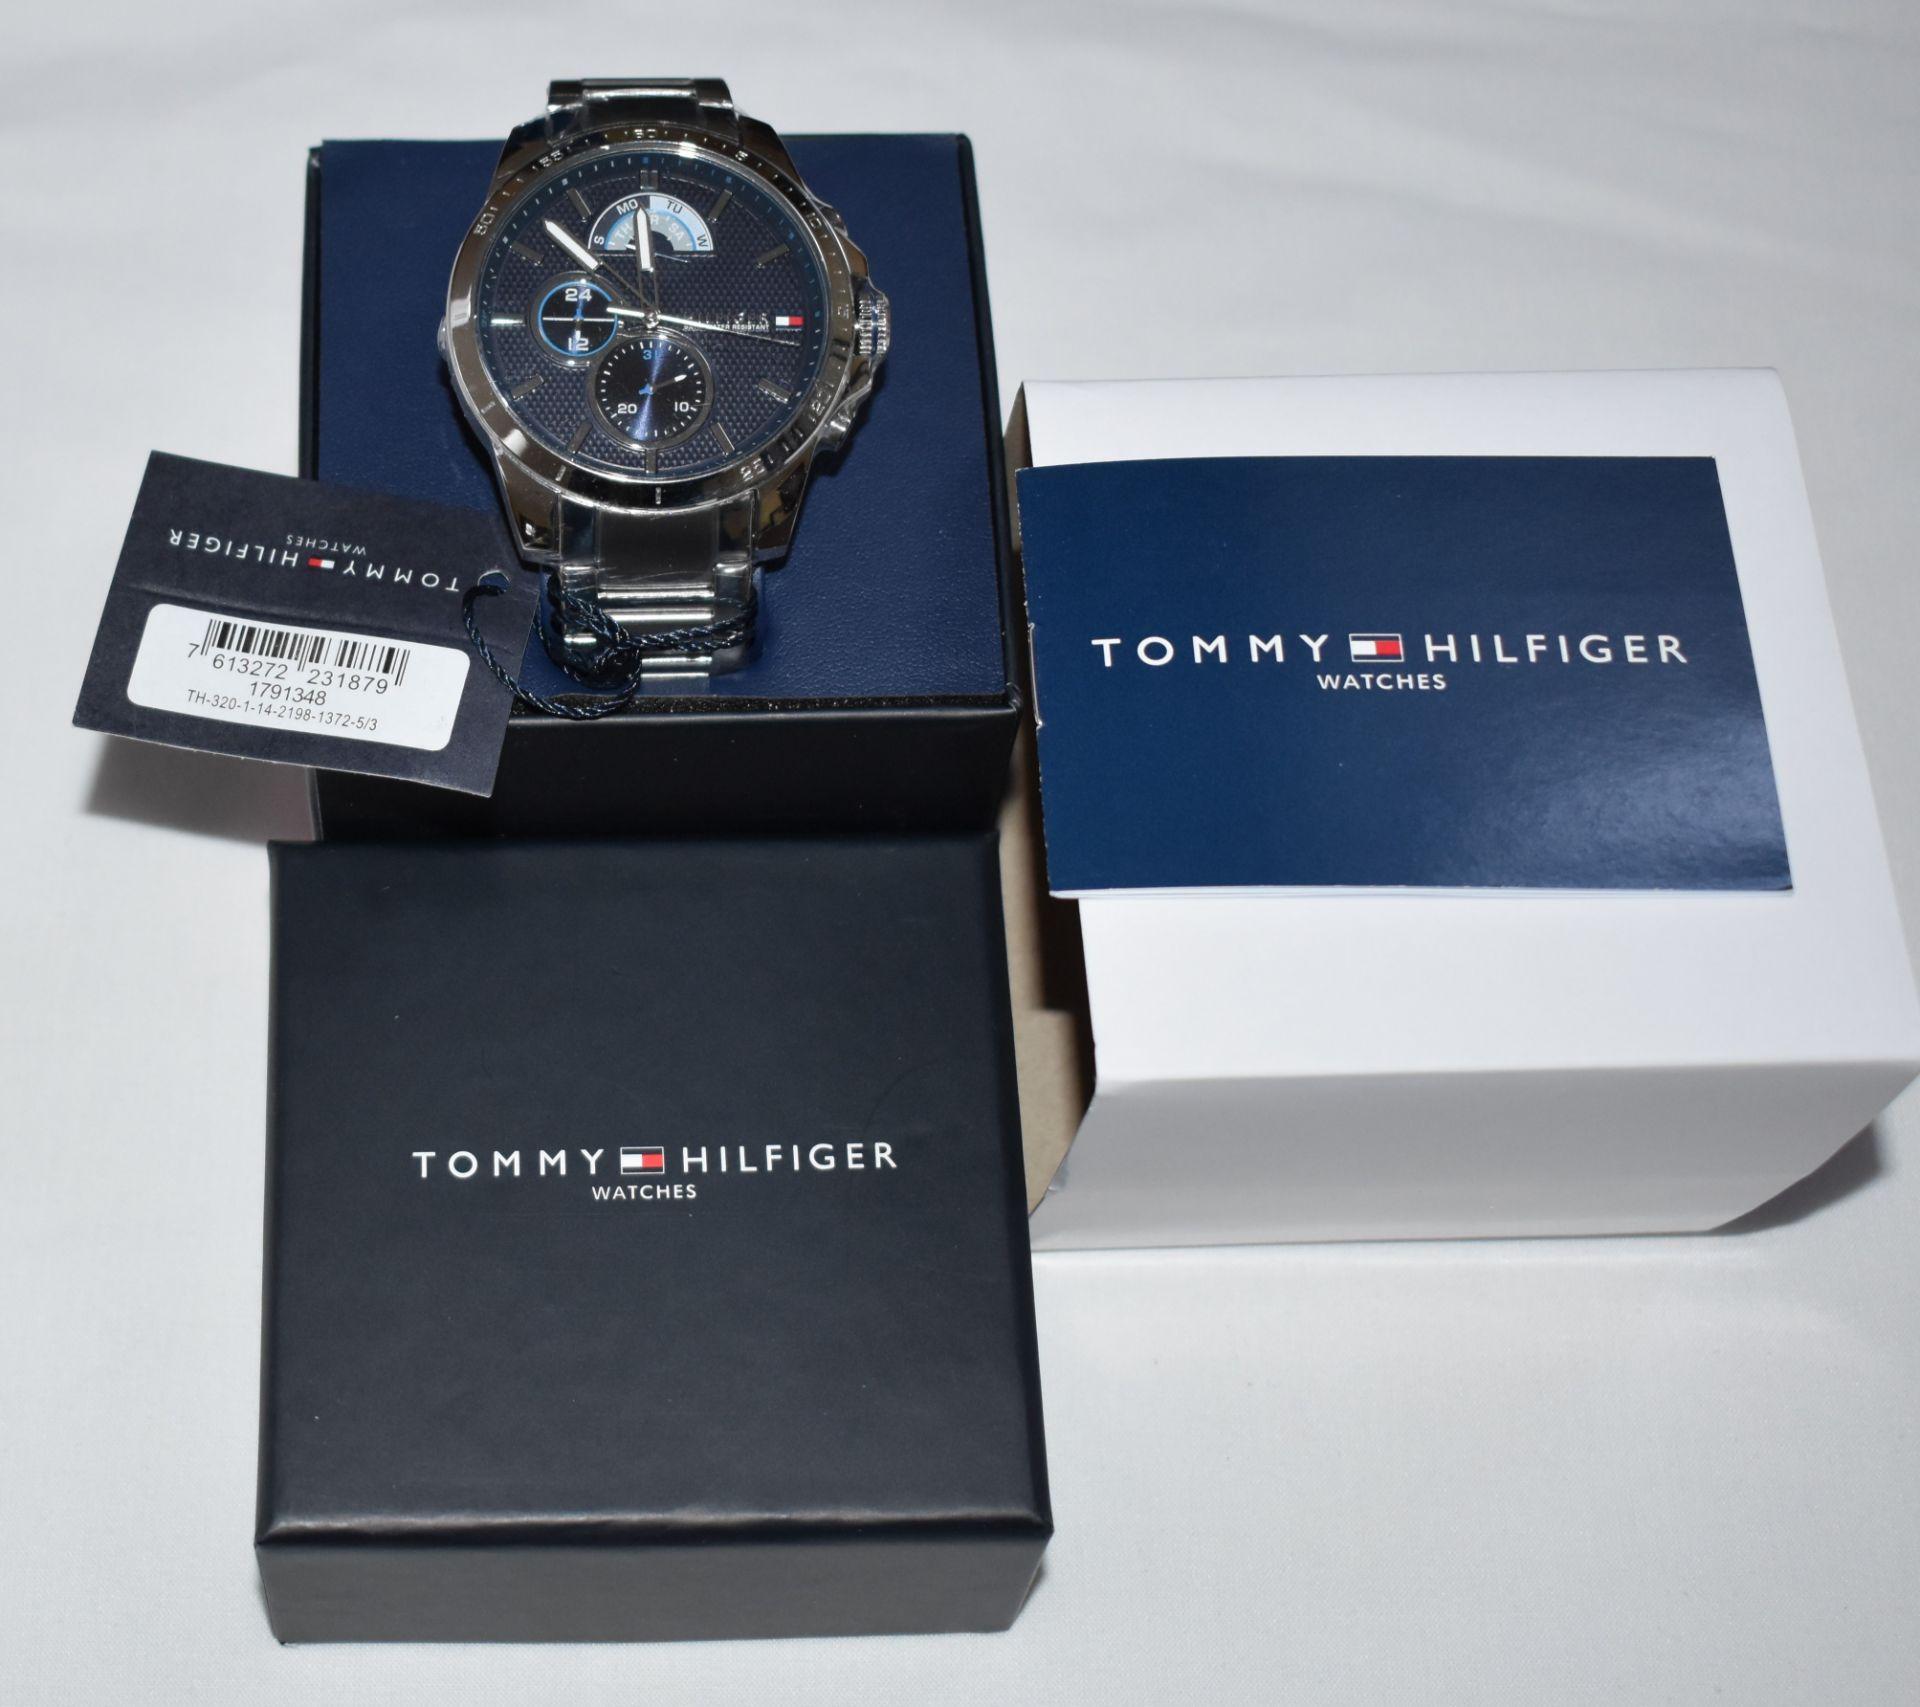 Tommy Hilfiger Men's Watch 1791348 - Image 3 of 3